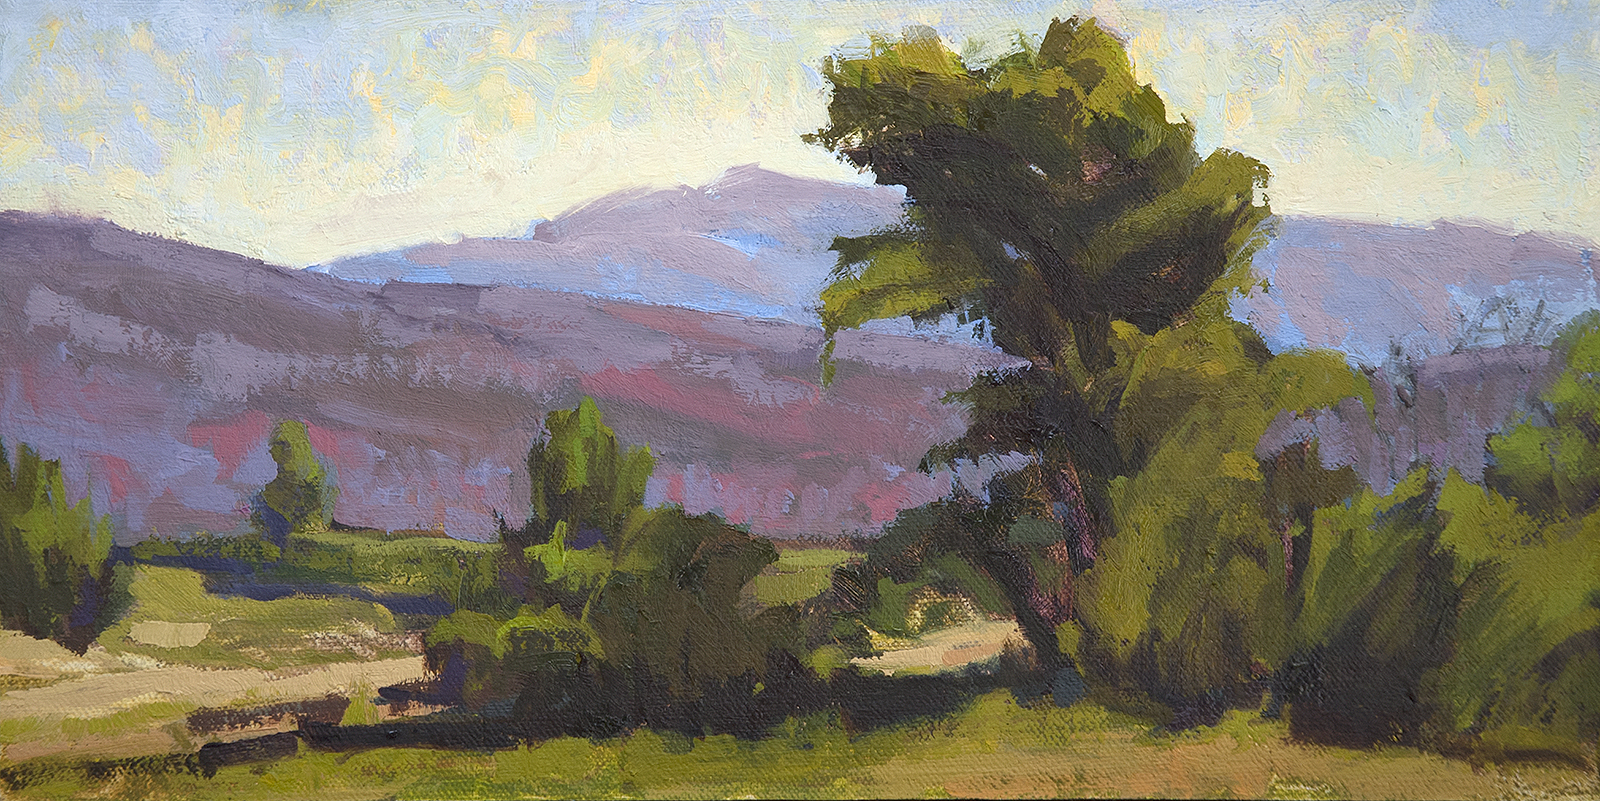 New Mexico Landscape III